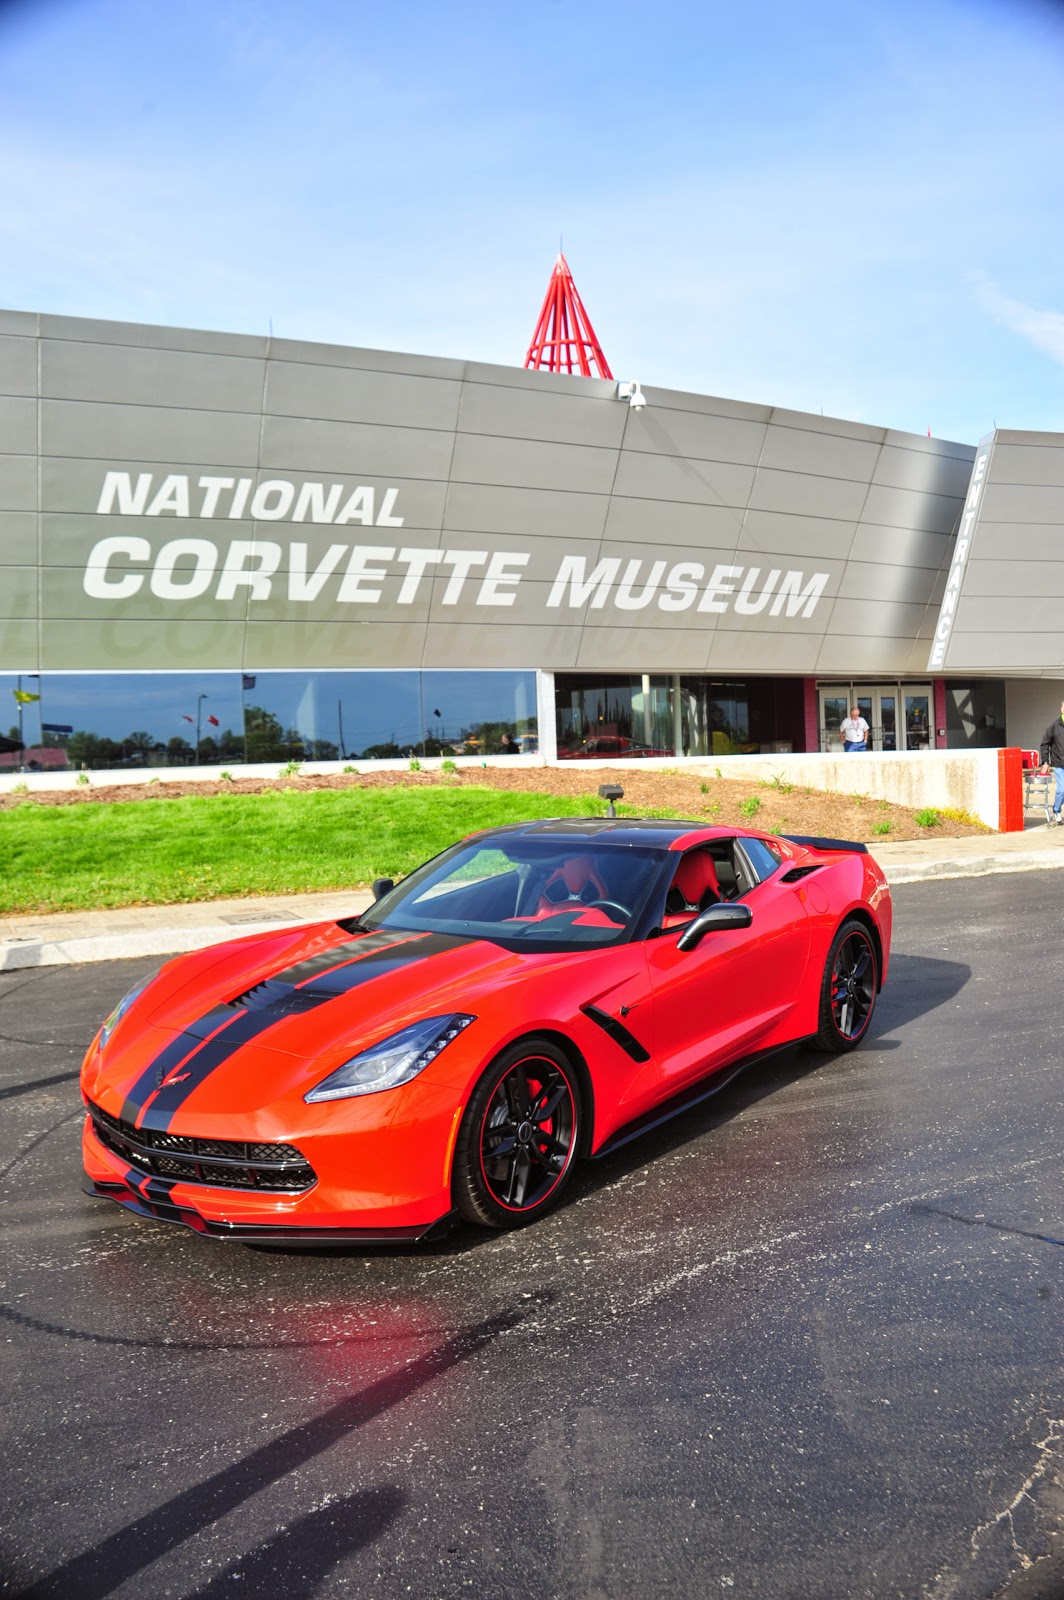 National Corvette Museum 2015 Corvette Offers Atlantic